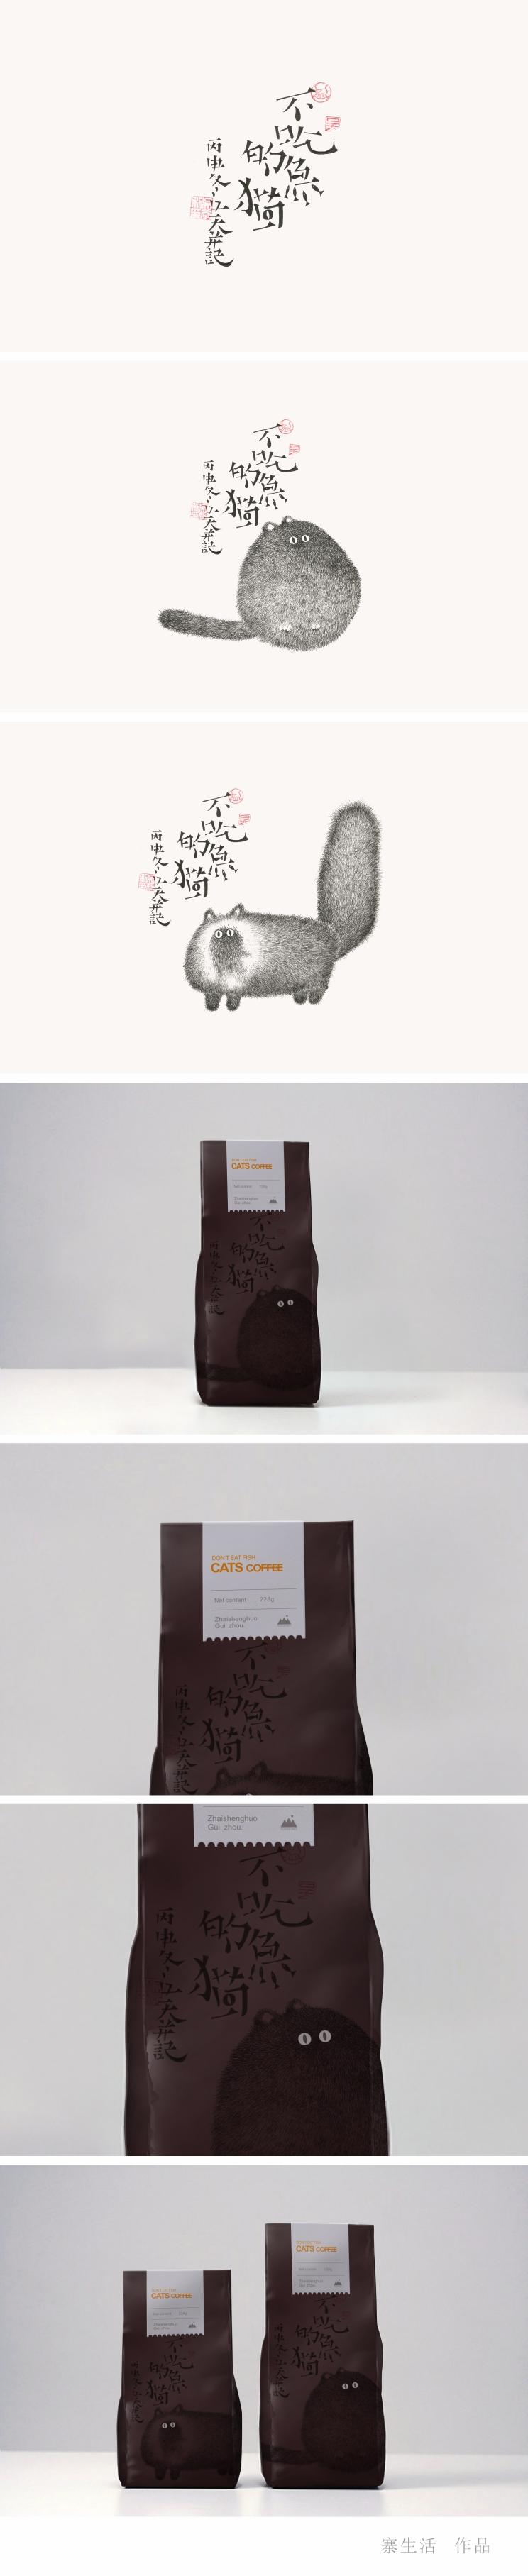 coffee-包装设计.jpeg